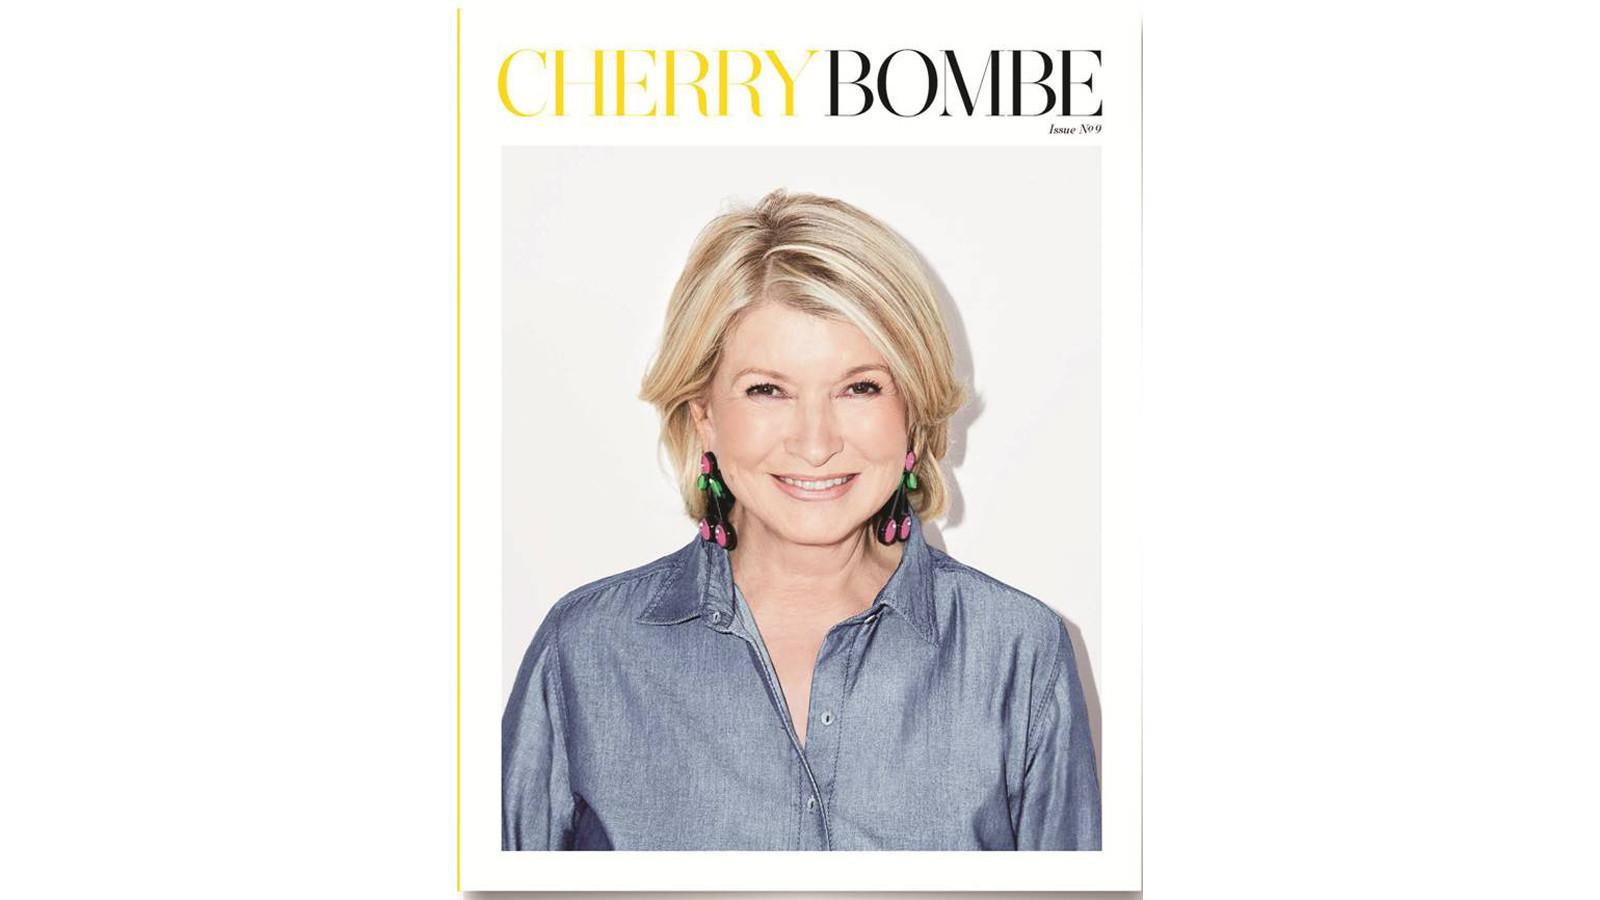 The Cherry Bombe magazine celebrates women in food.